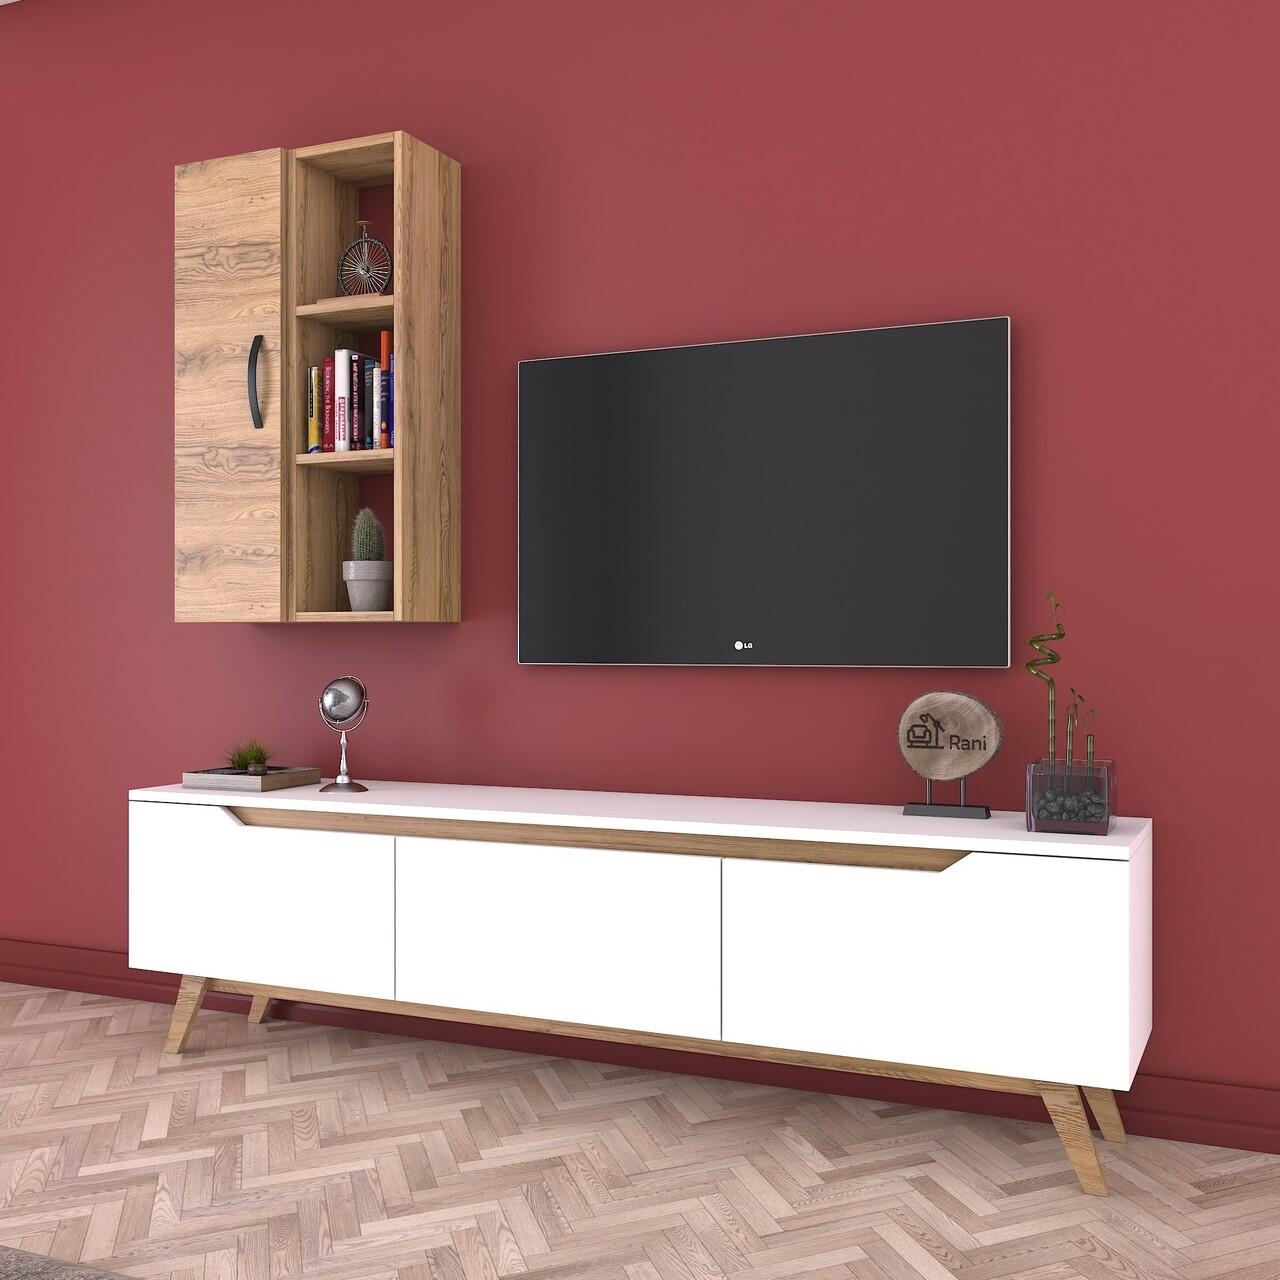 Comoda TV cu raft de perete si cabinet M37 - 422, Wren, 180 x 35 x 48.6 cm/90 cm, white/walnut